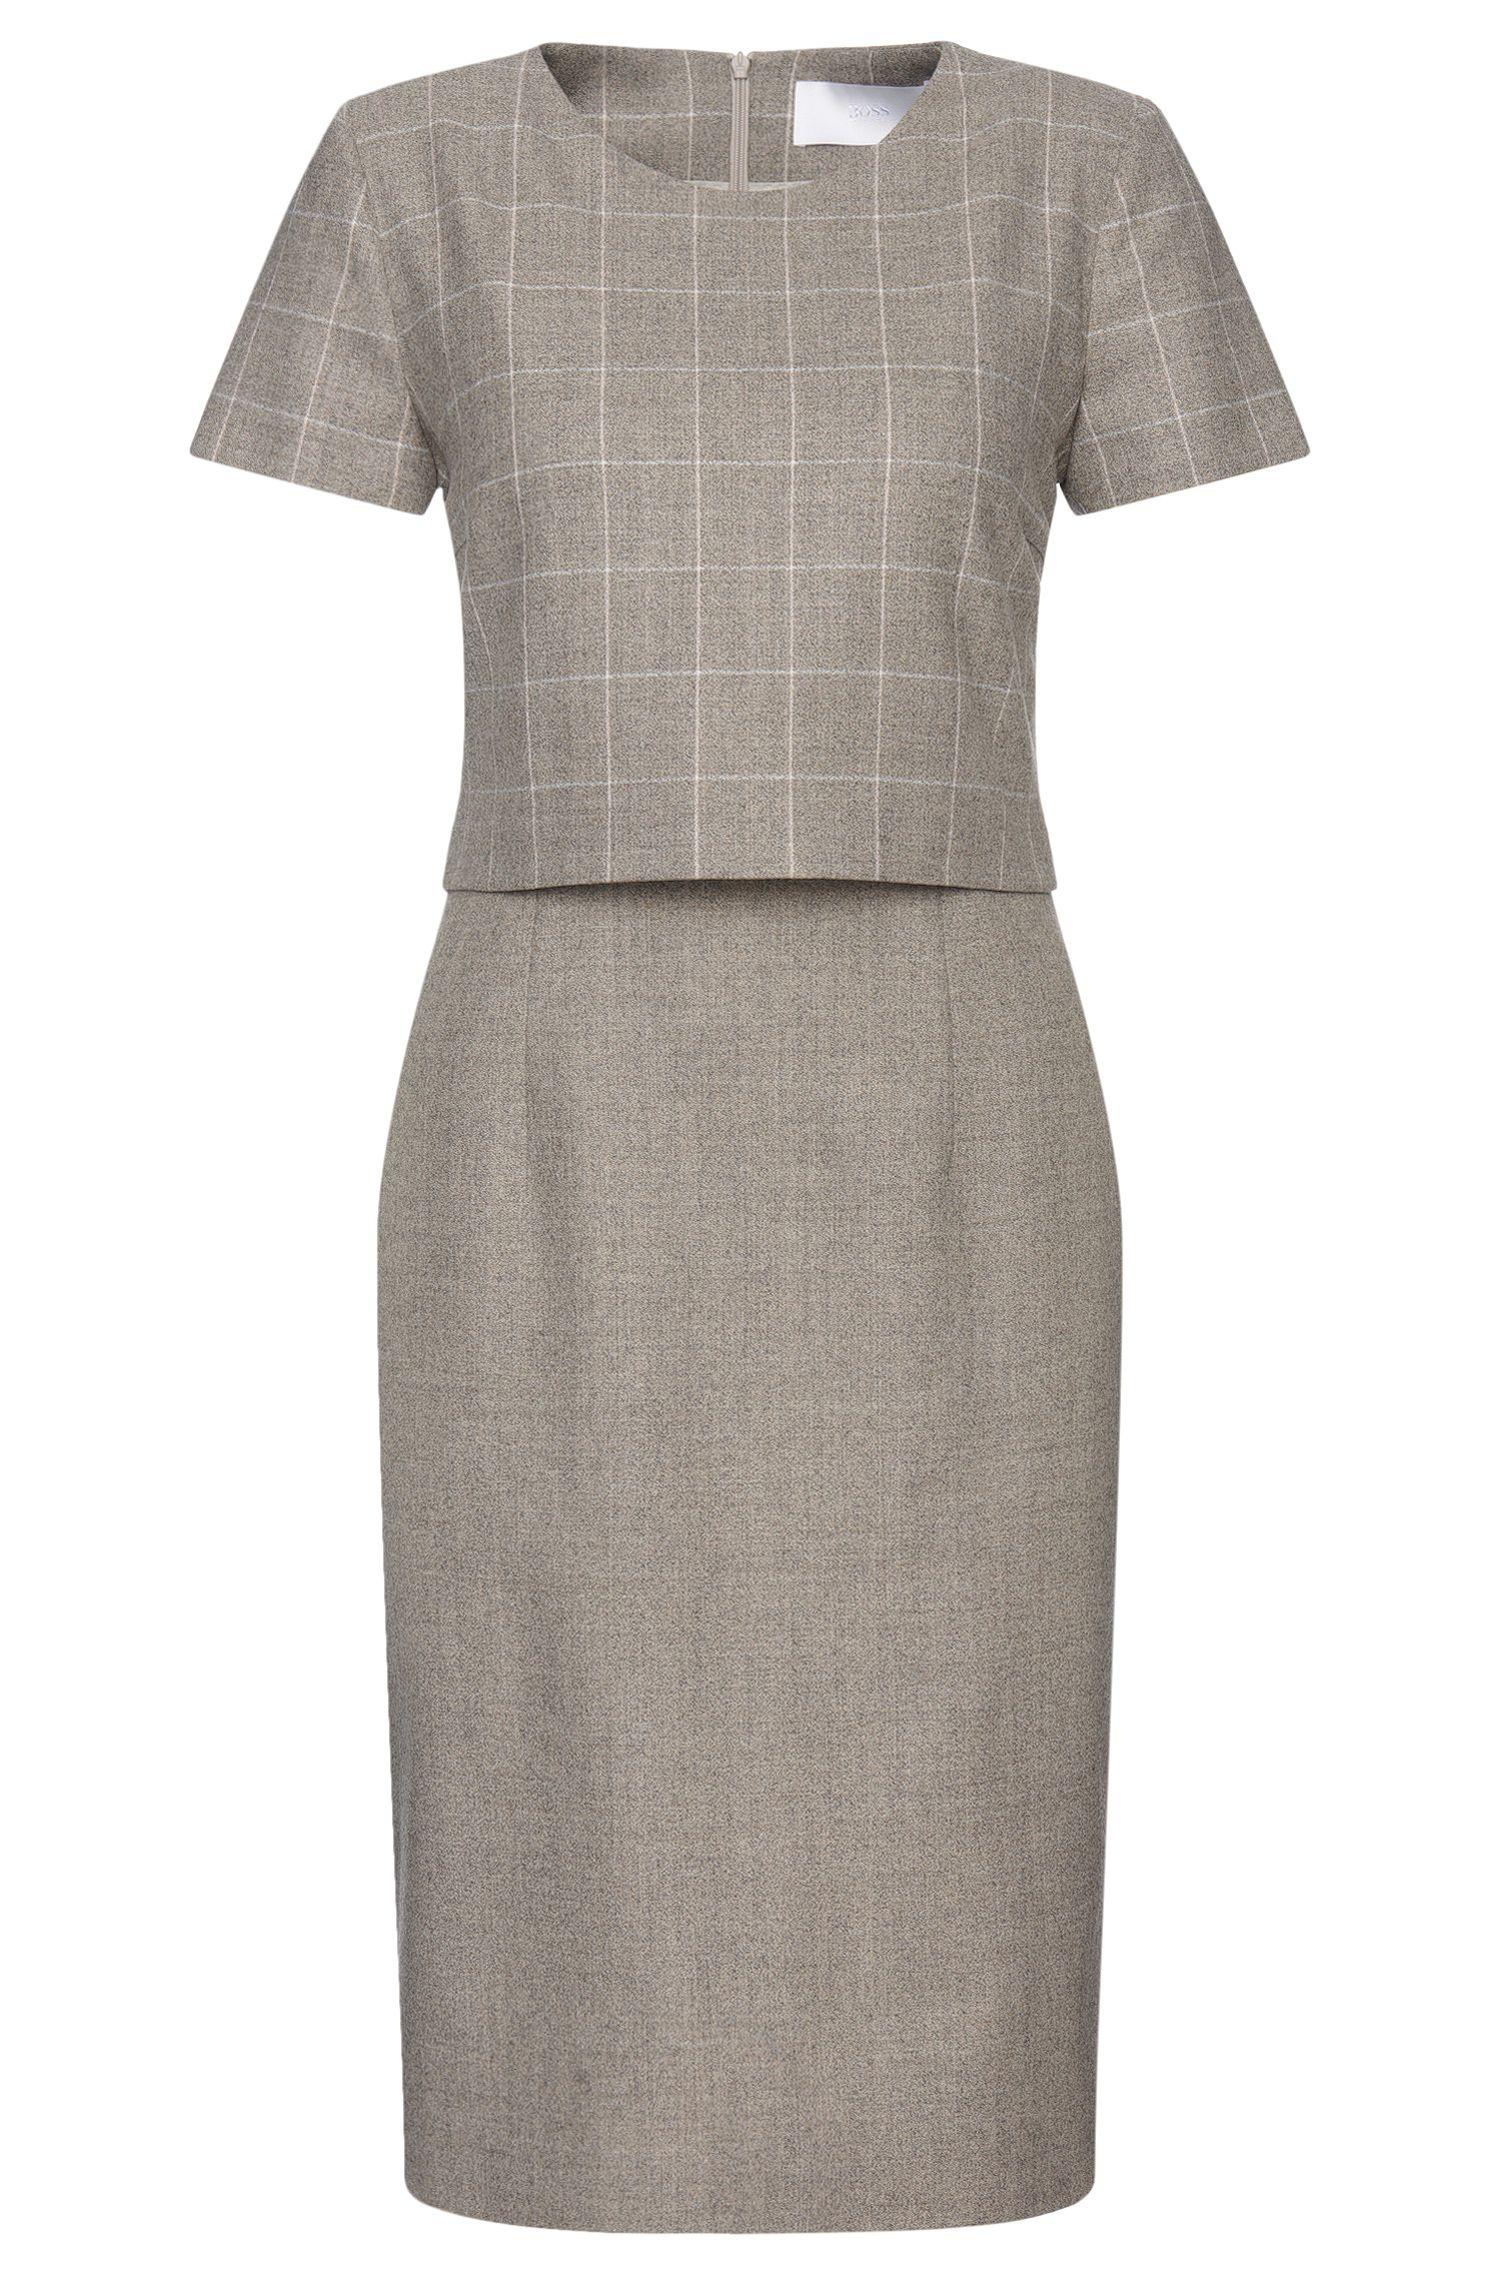 'Decara' | Stretch Virgin Wool Layered Shift Dress